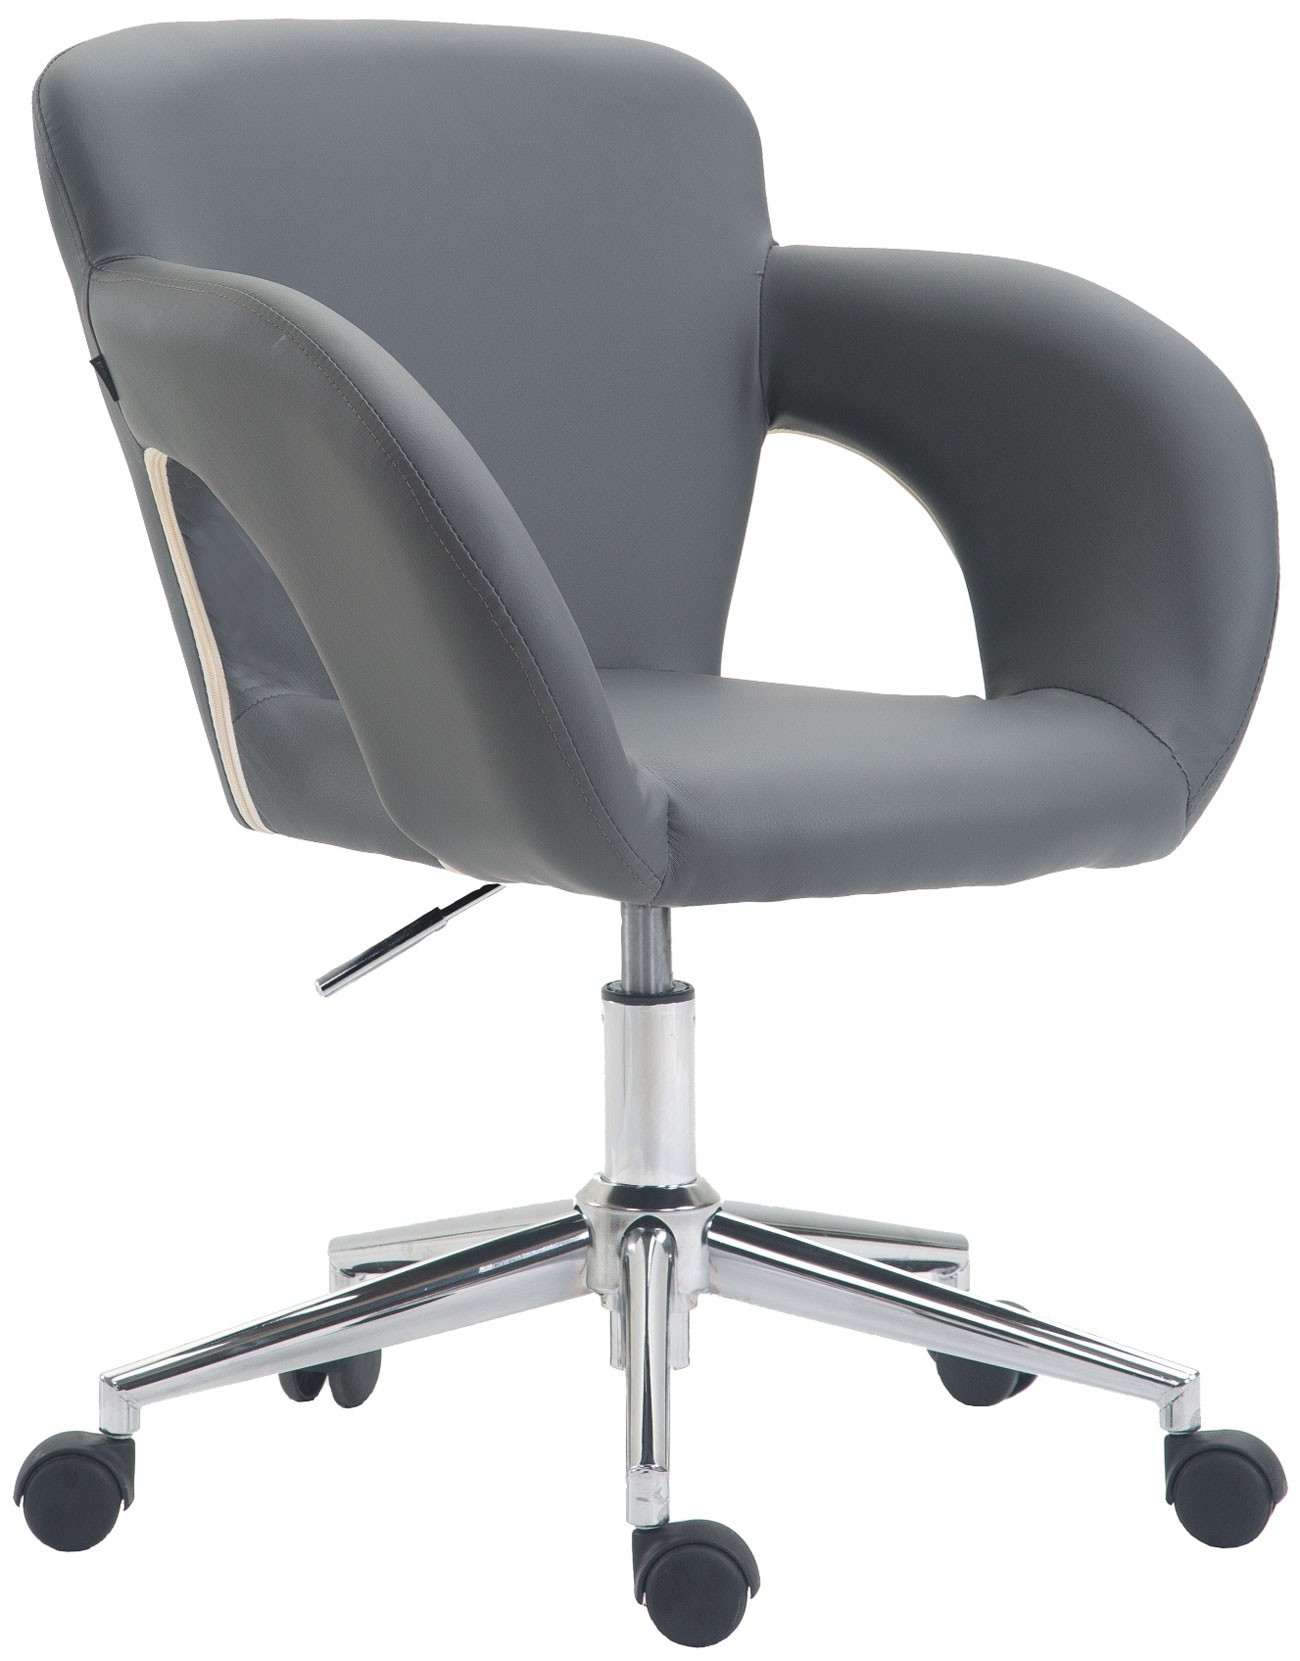 Chaise de bureau Edison similicuir